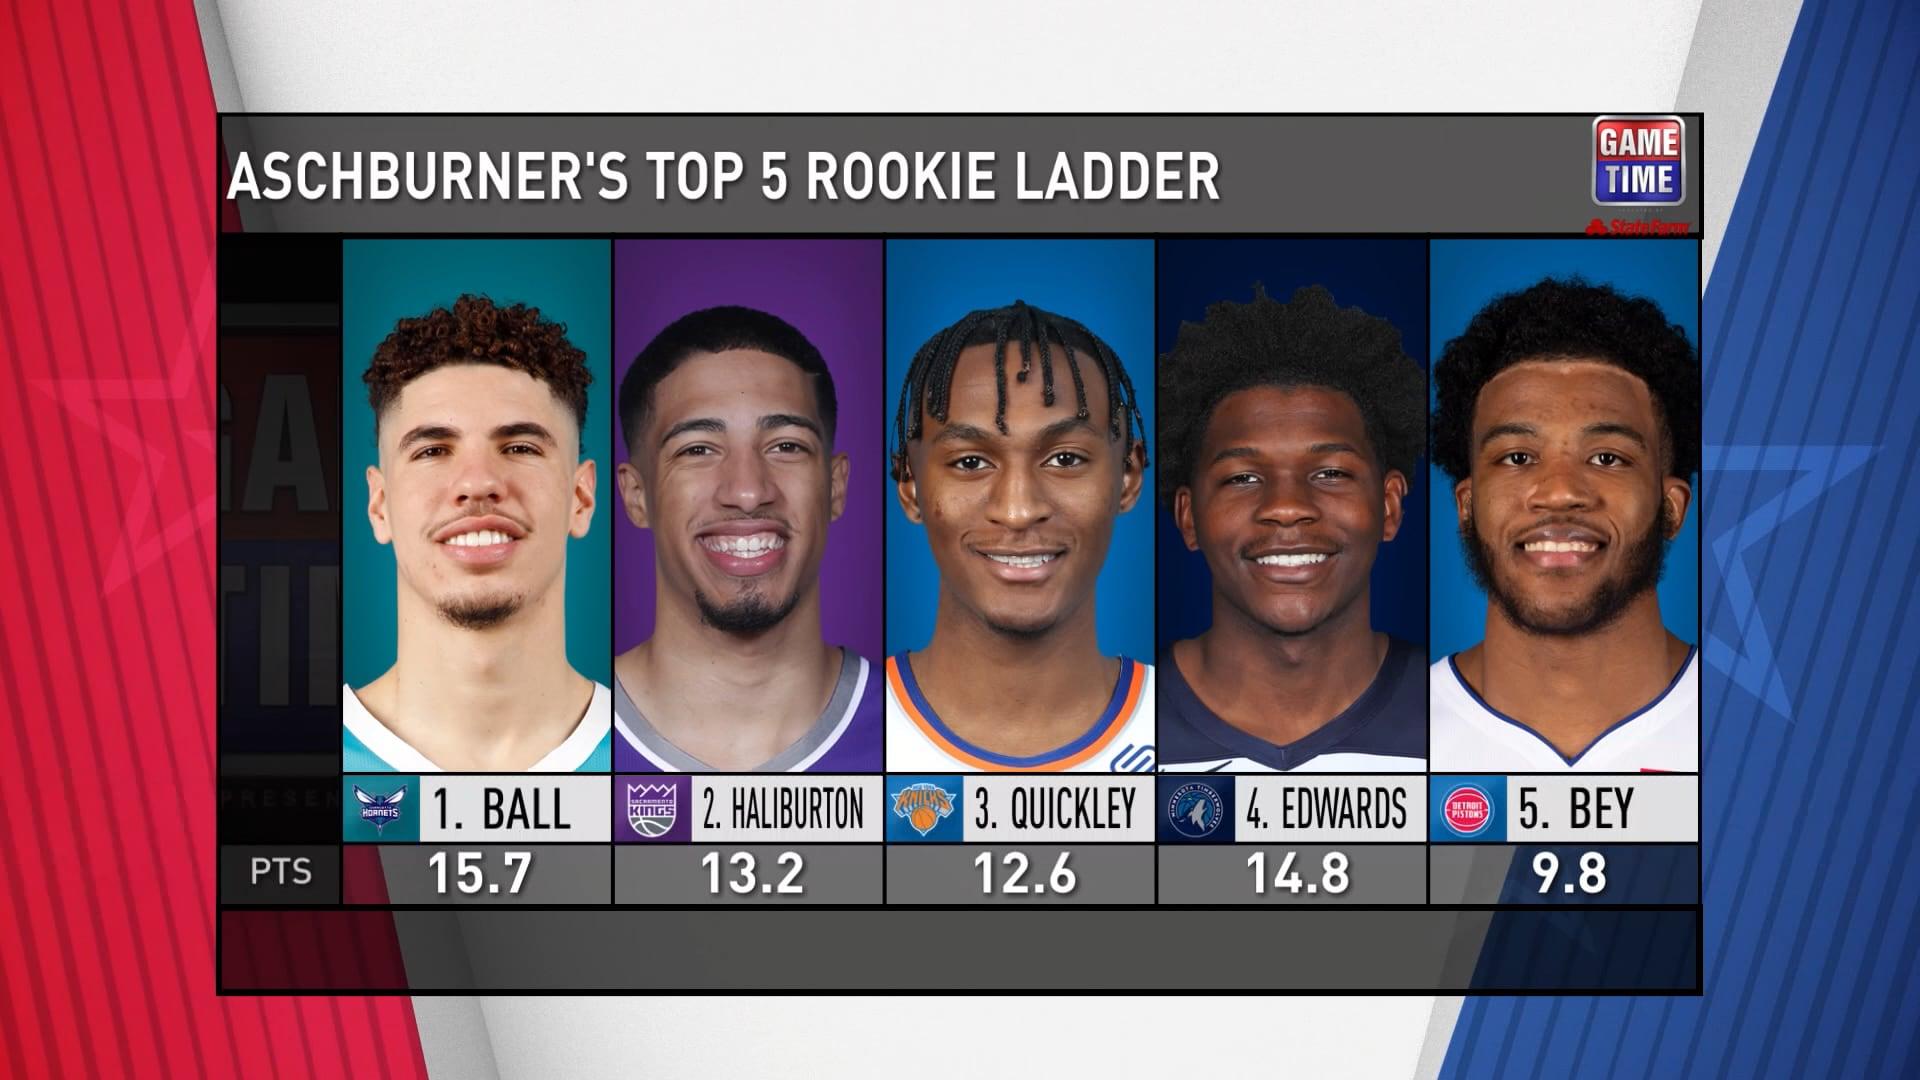 Steve Aschburner's midseason Rookie Ladder